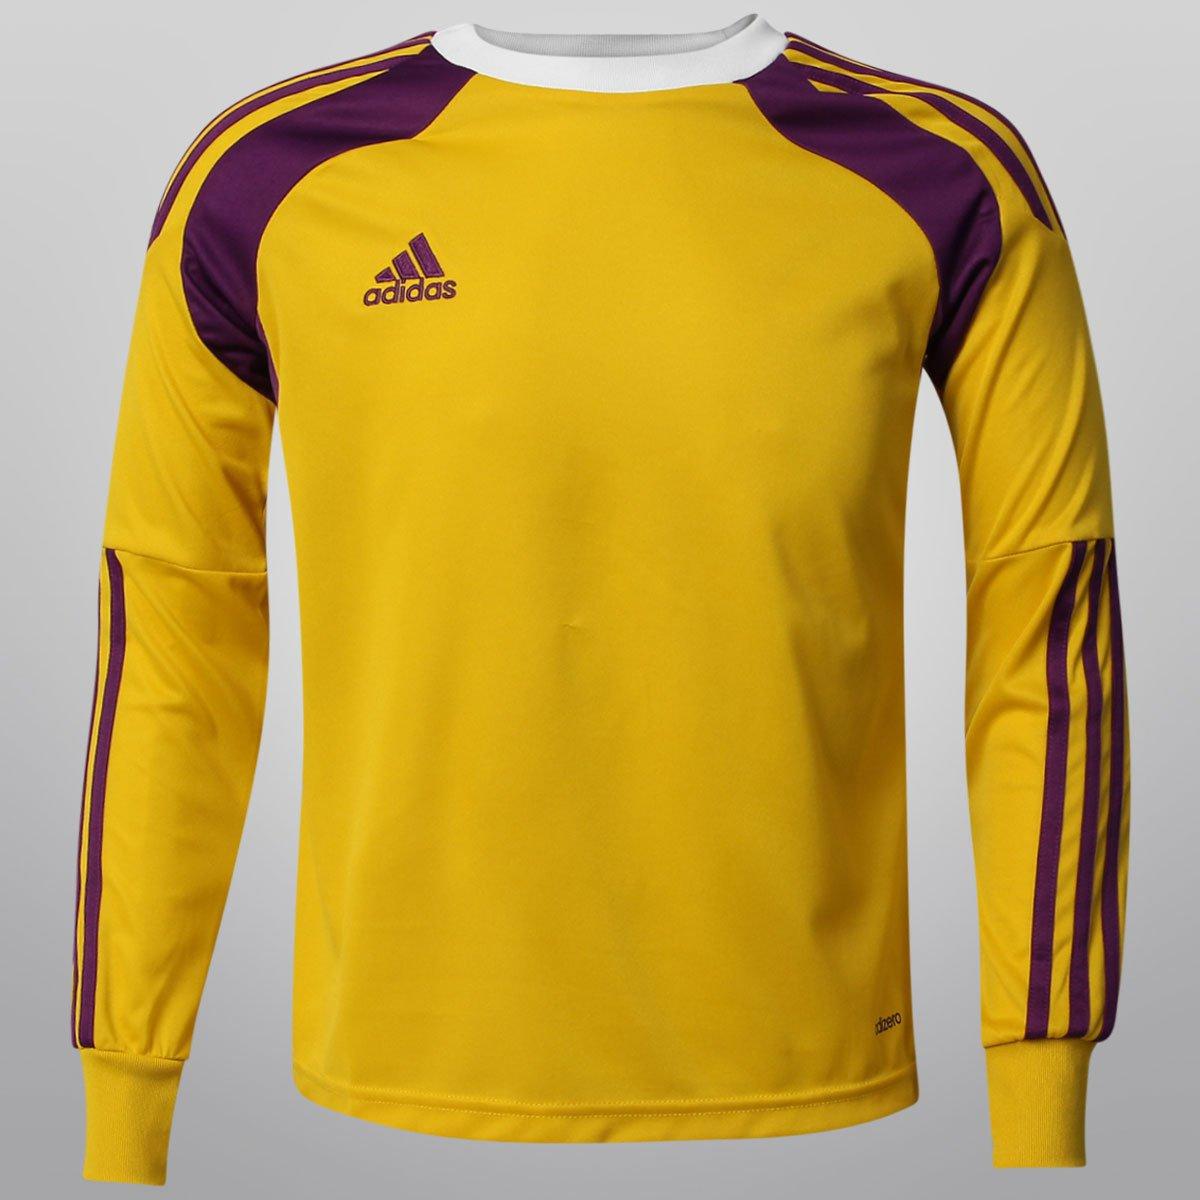 Camisa Adidas Condivo 14 Goleiro Juvenil